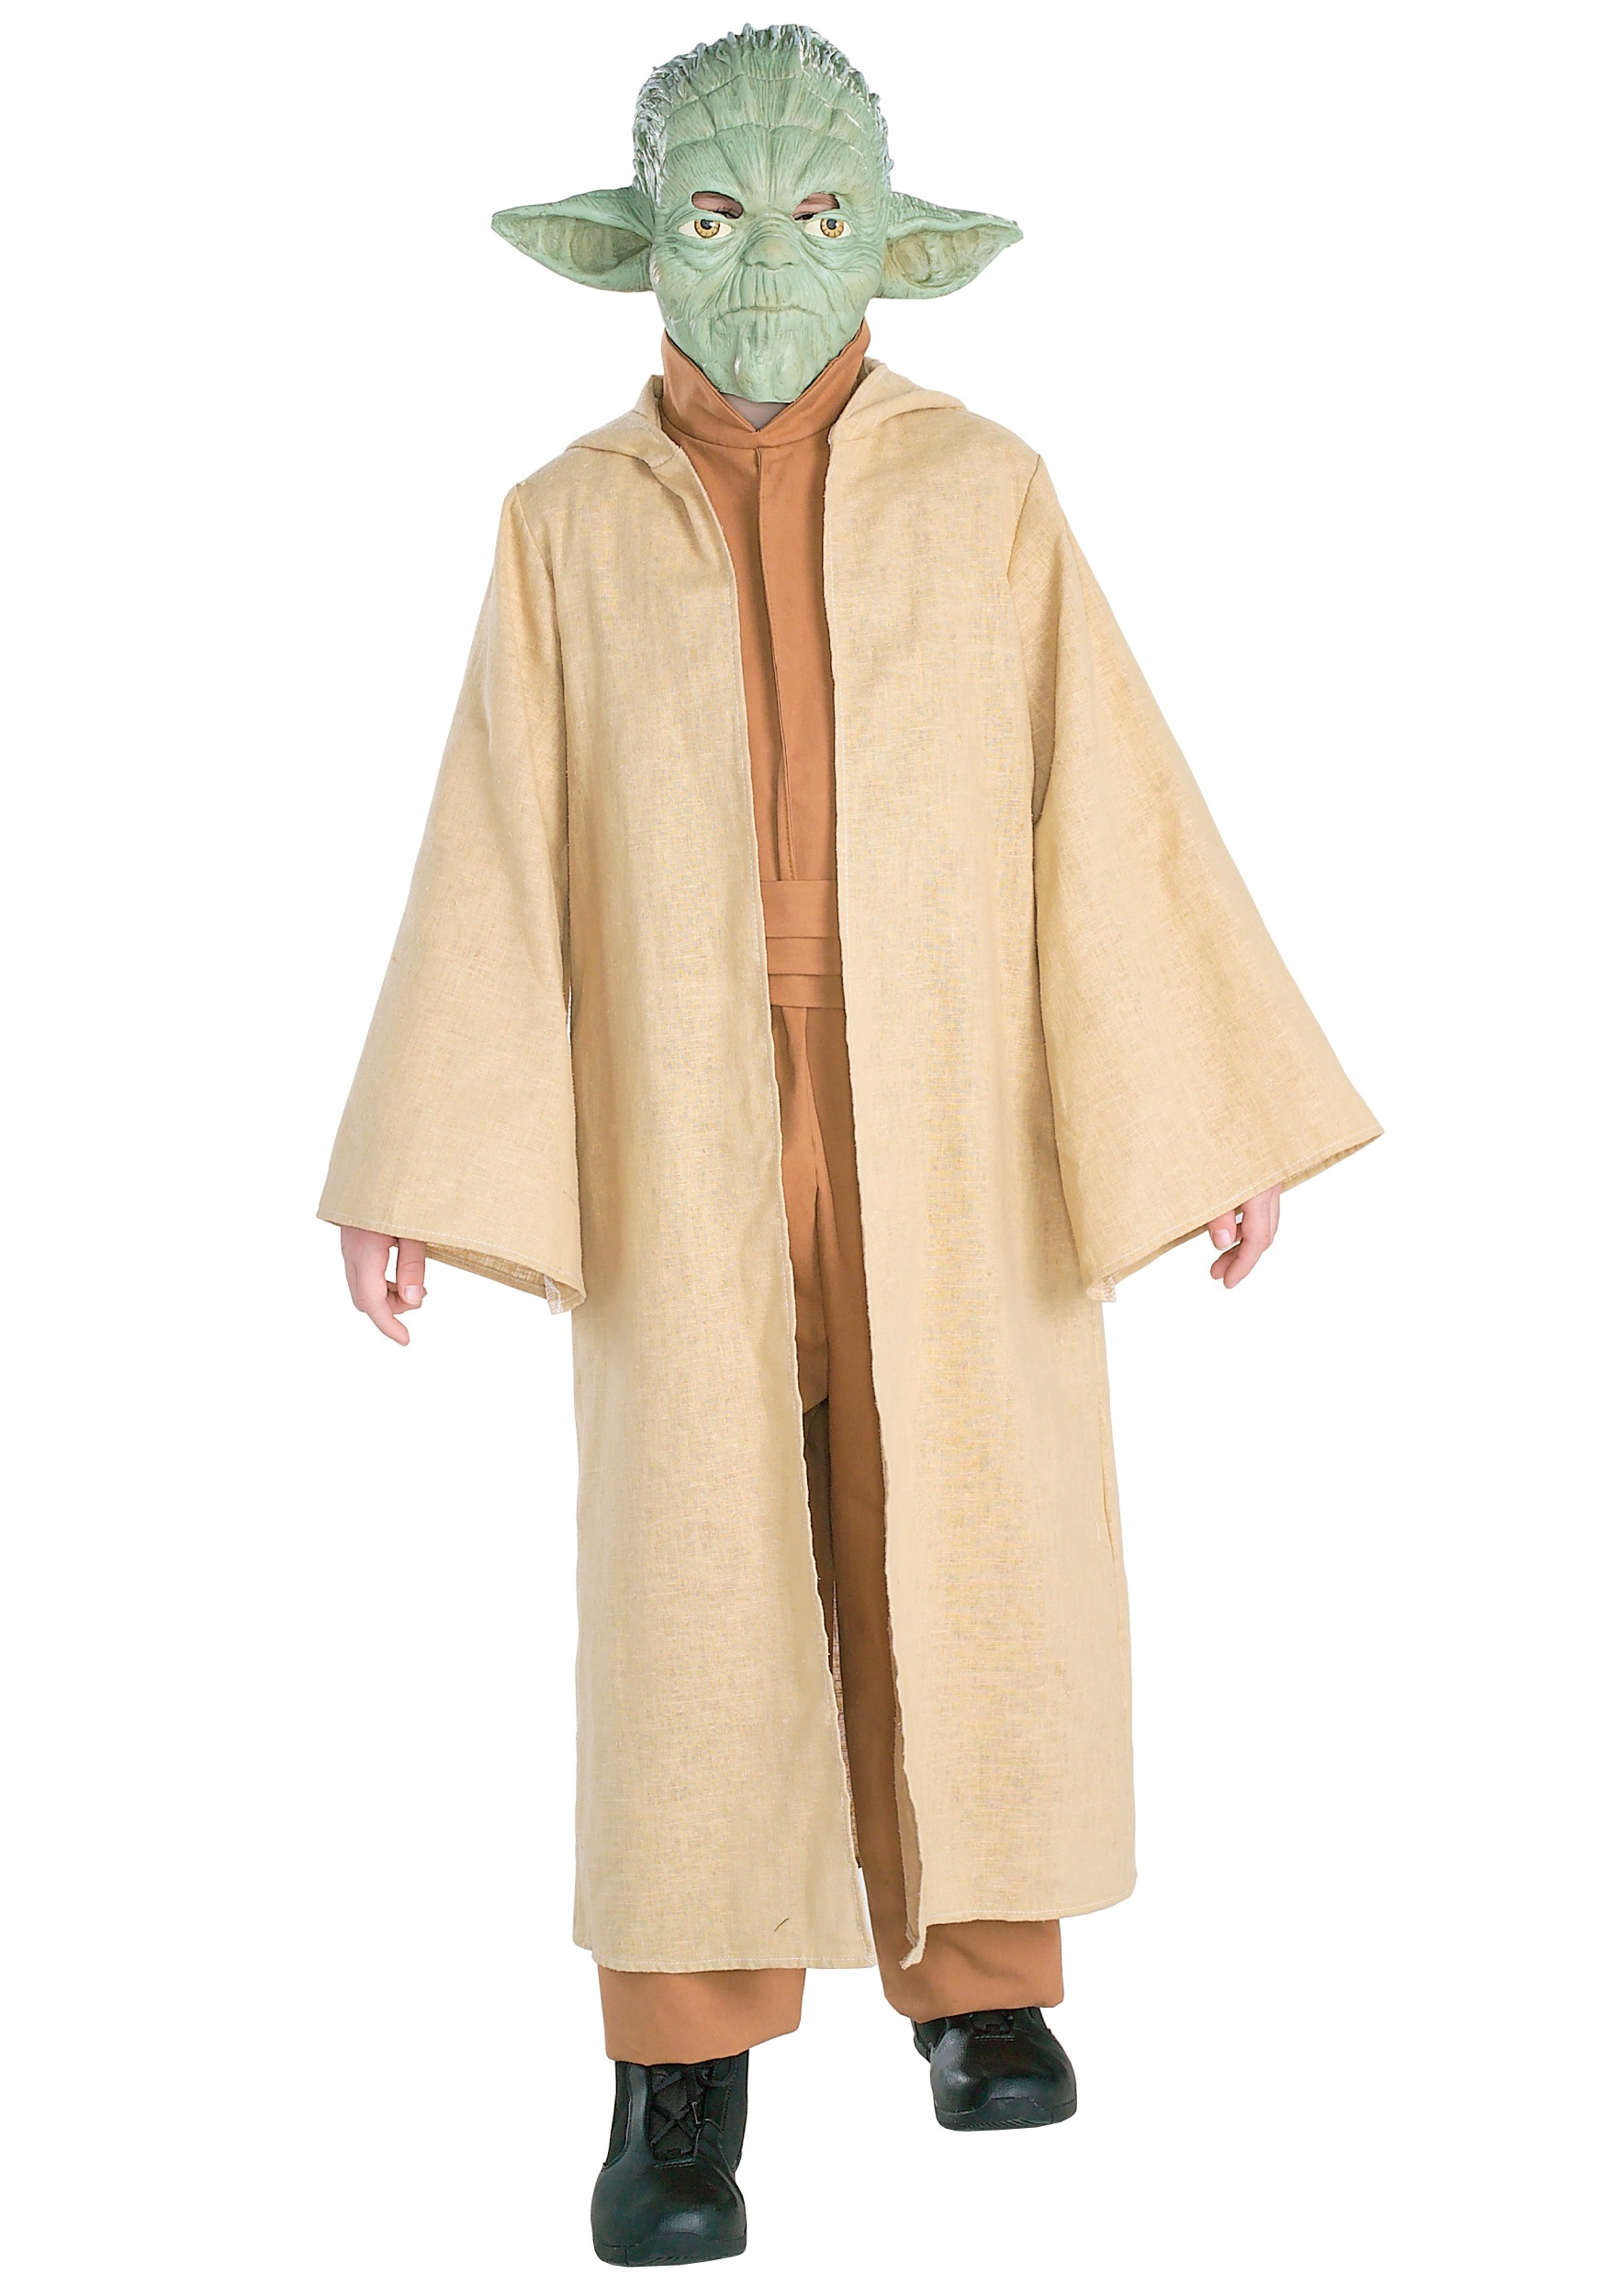 Yoda 3//4 Vinyl Mask Jedi Master Costume Accessory Kids Star Wars Halloween